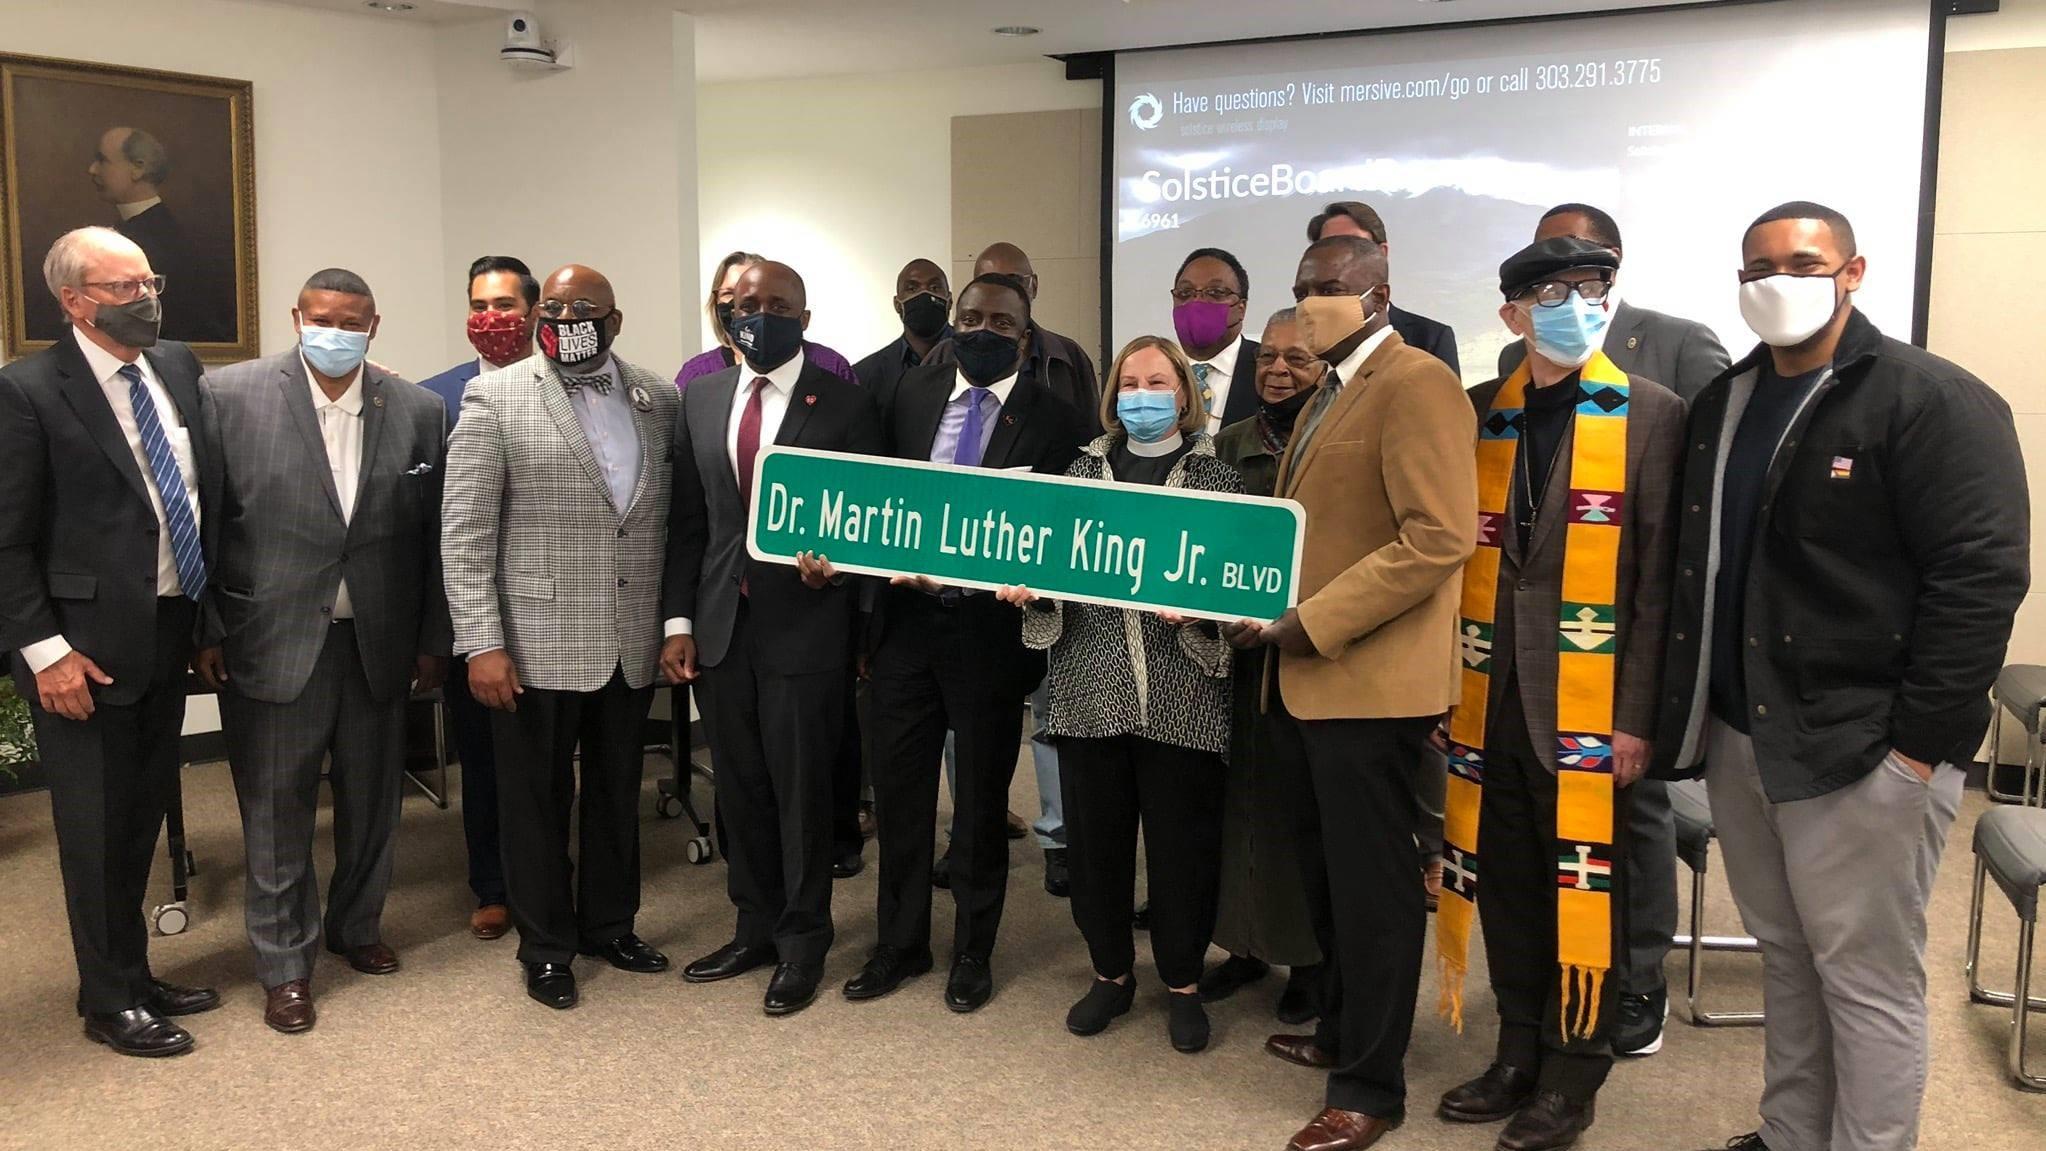 Martin Luther King Jr BLVD